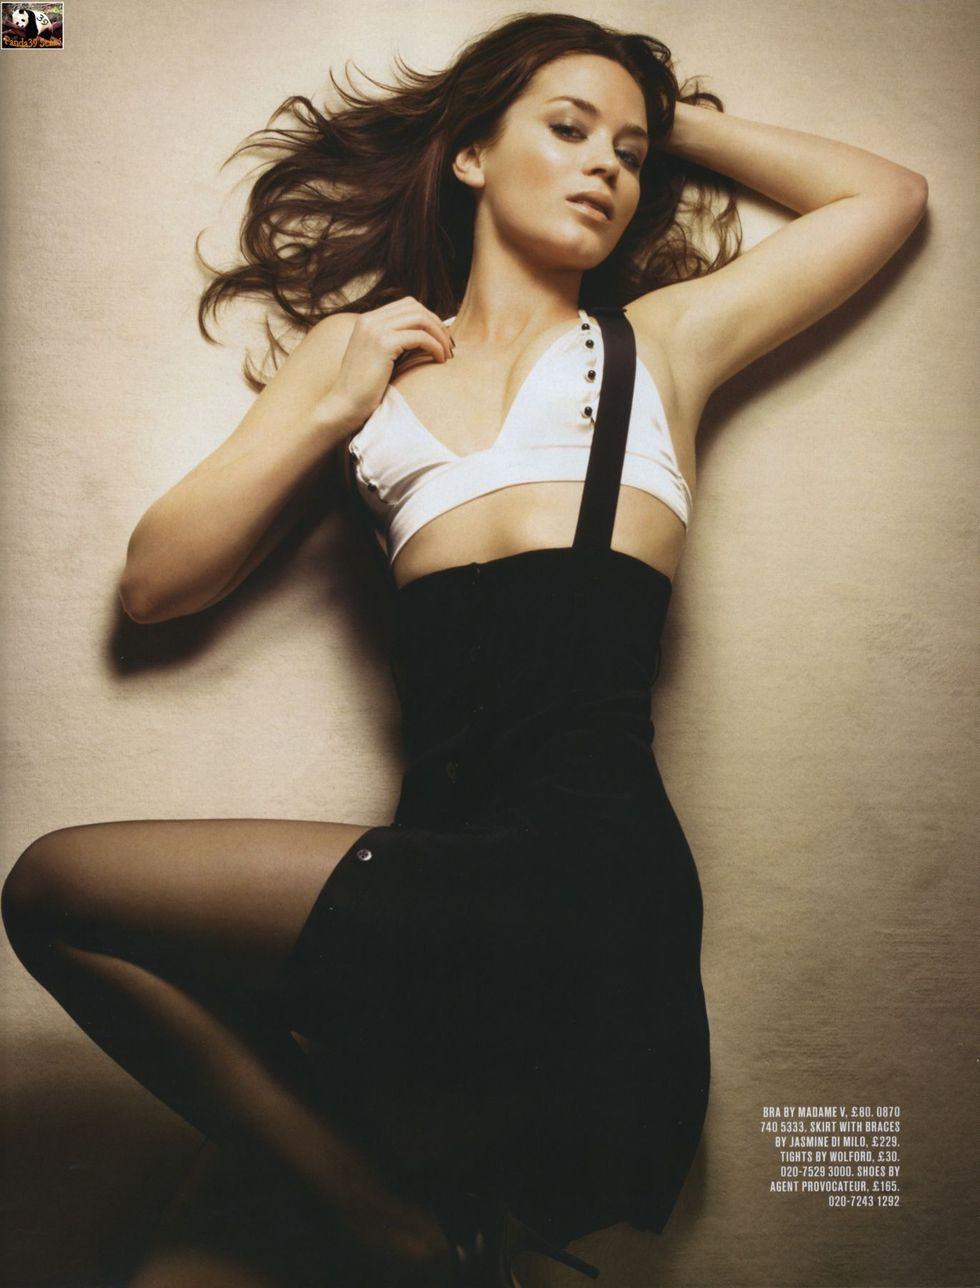 emily-blunt-gq-magazine-february-2008-01